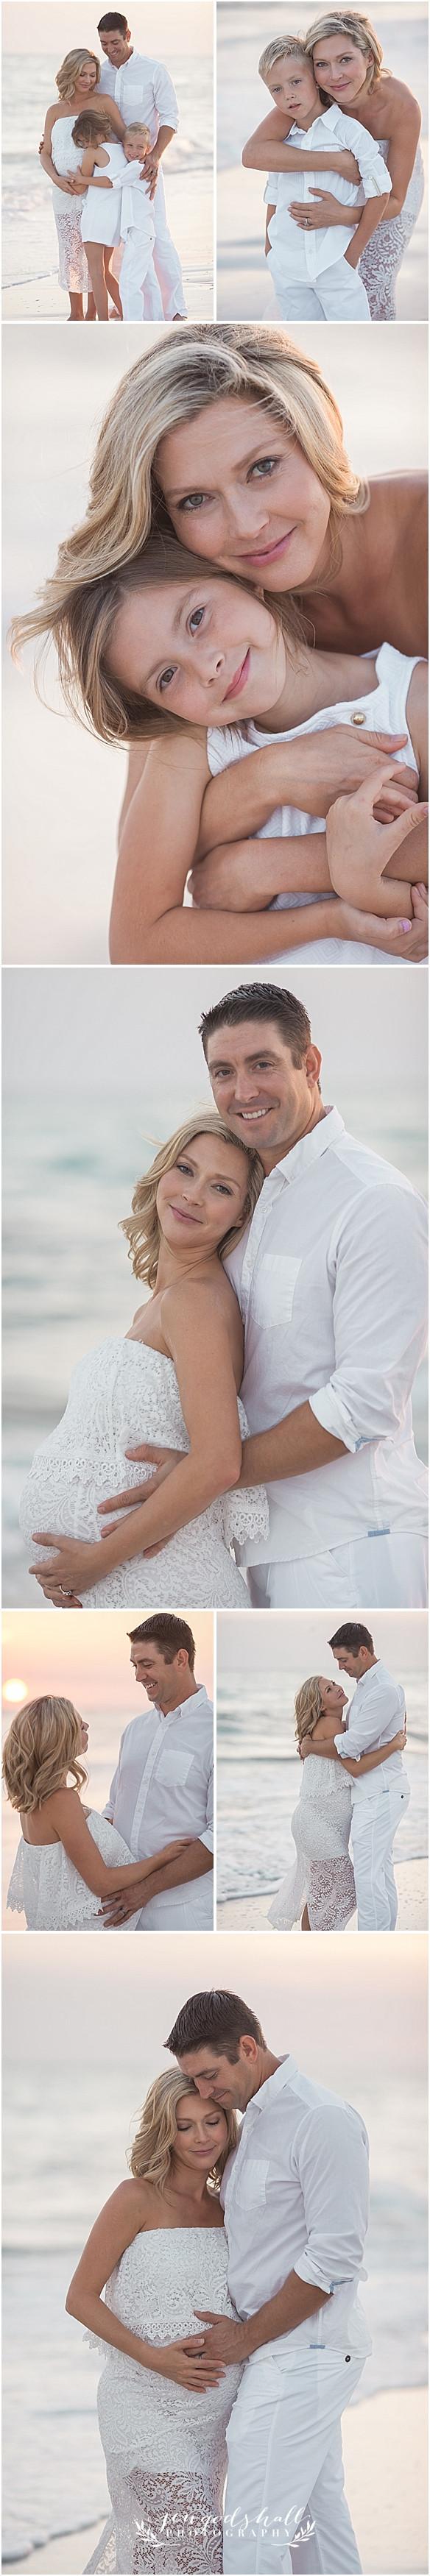 Sarasota Maternity Photographer - family beach photos